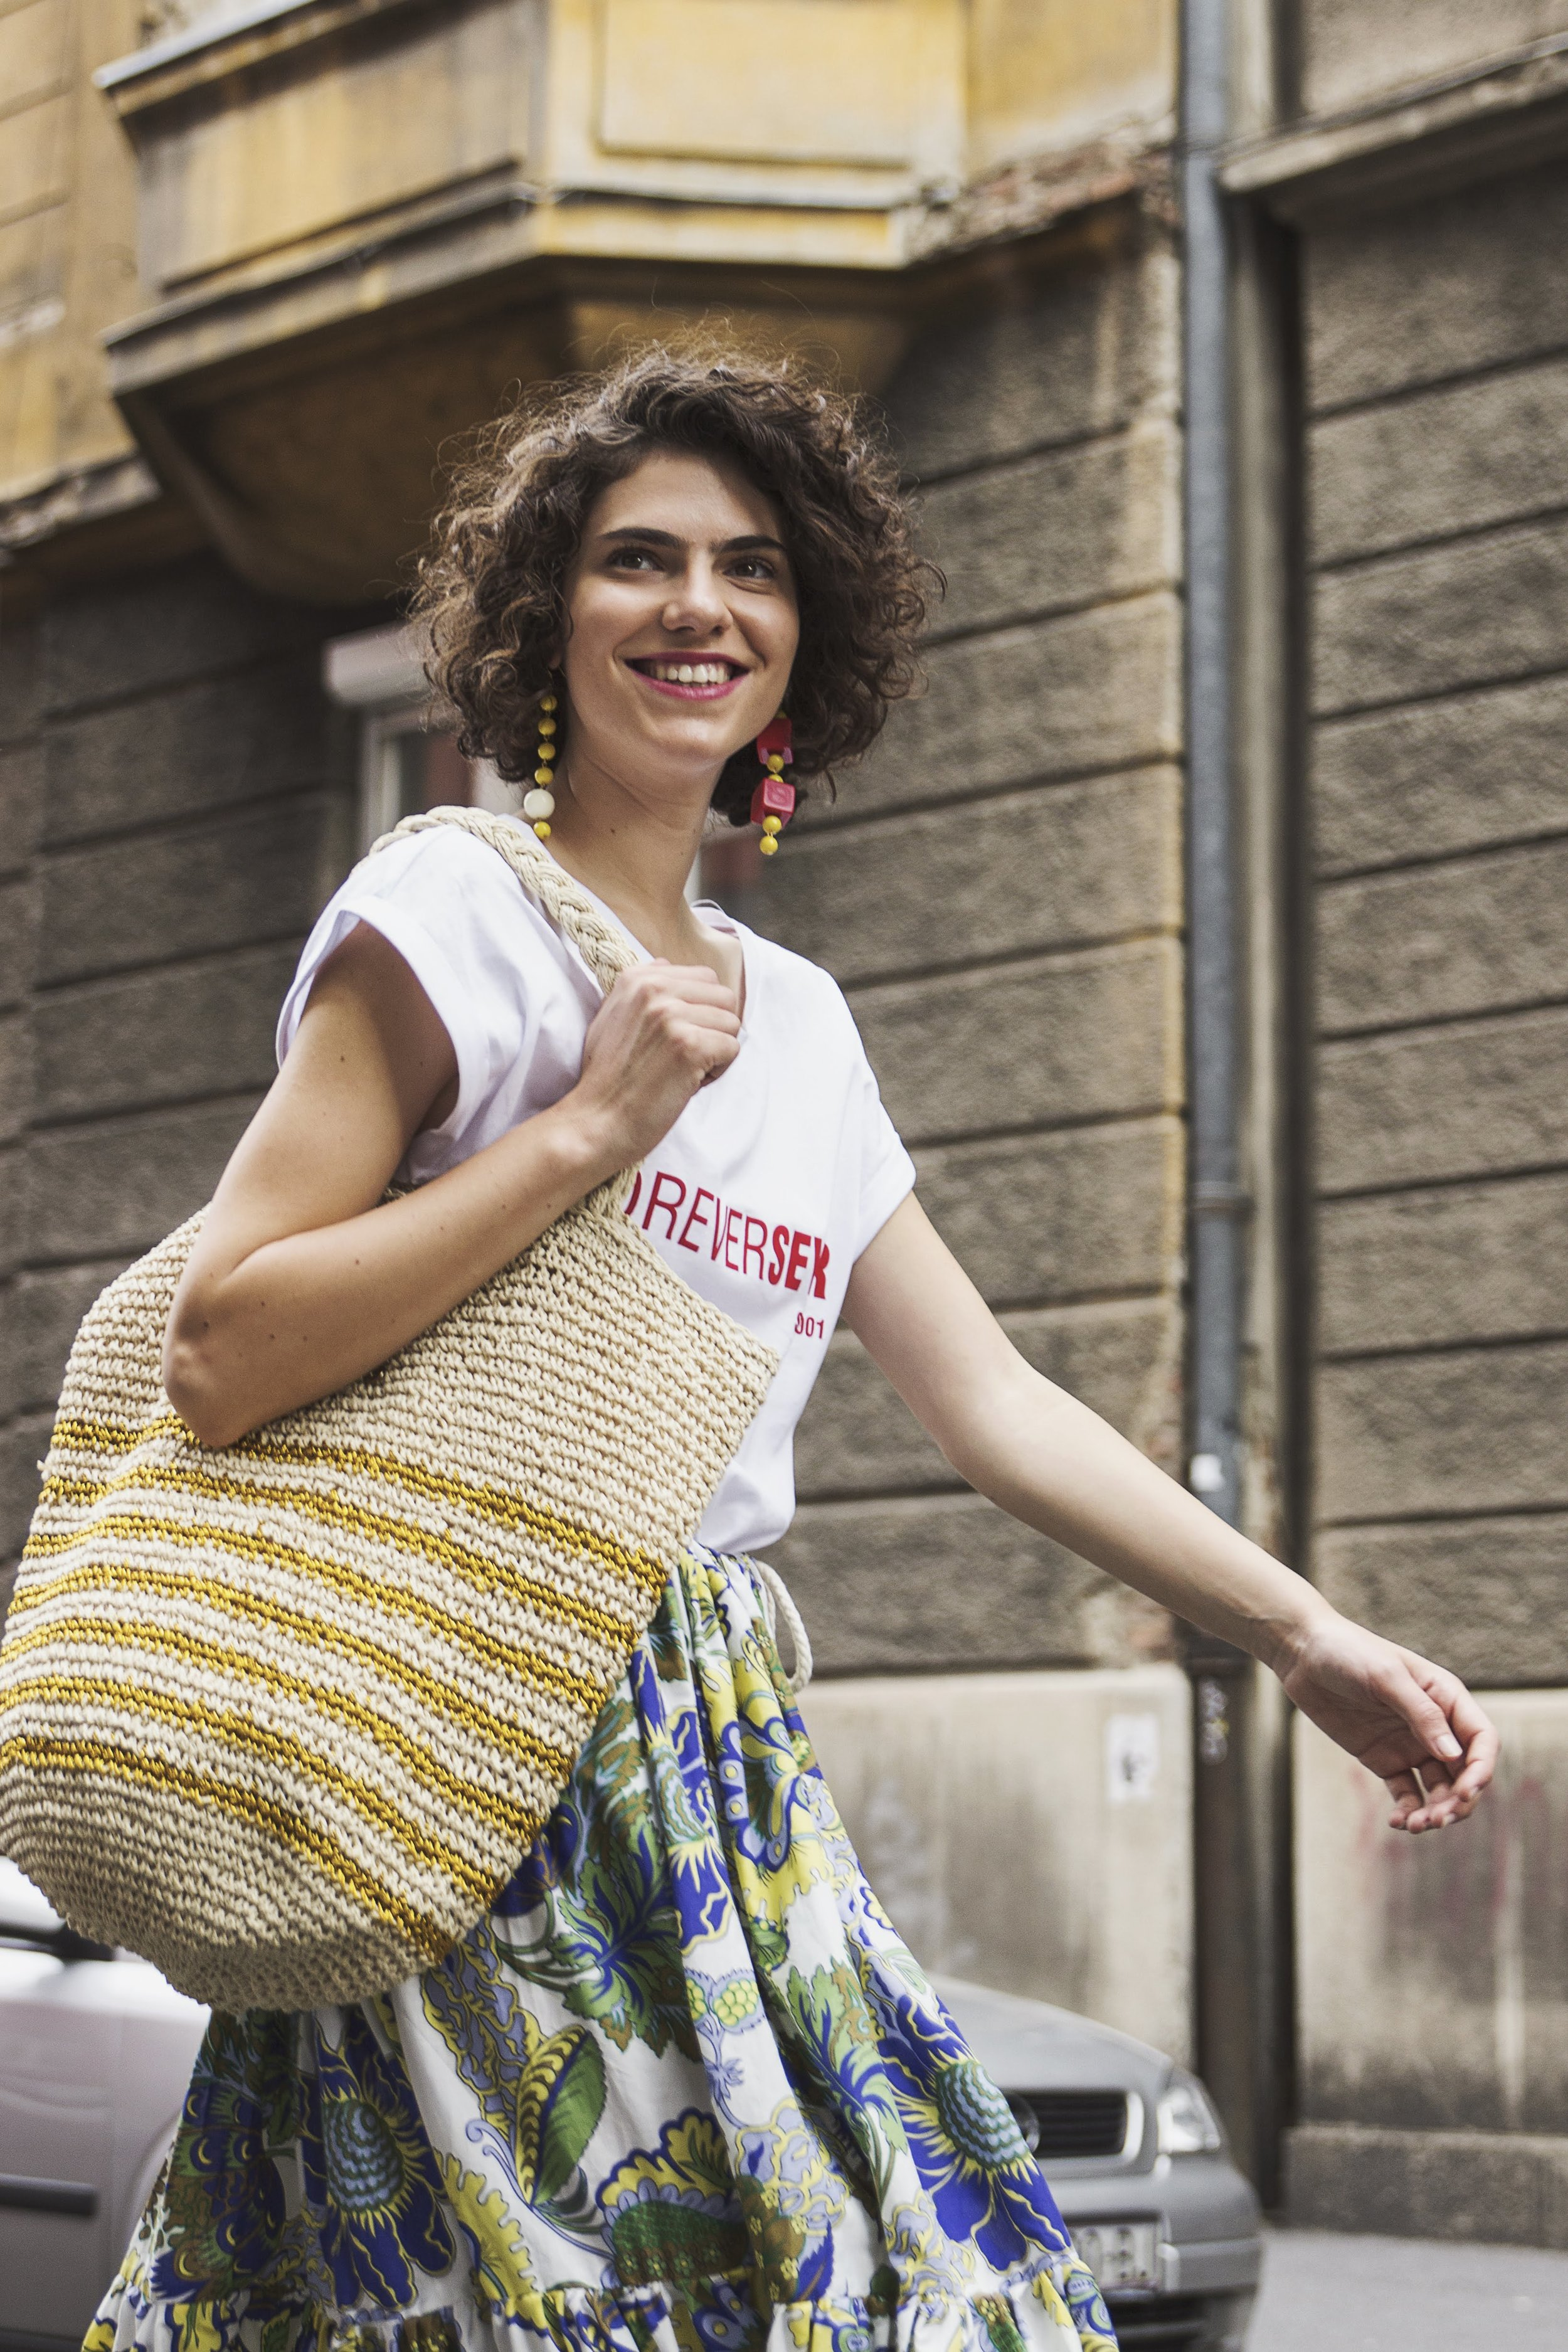 luka-lajic-fashion-photography-robert-sever-dizajner-croatian (2).jpg